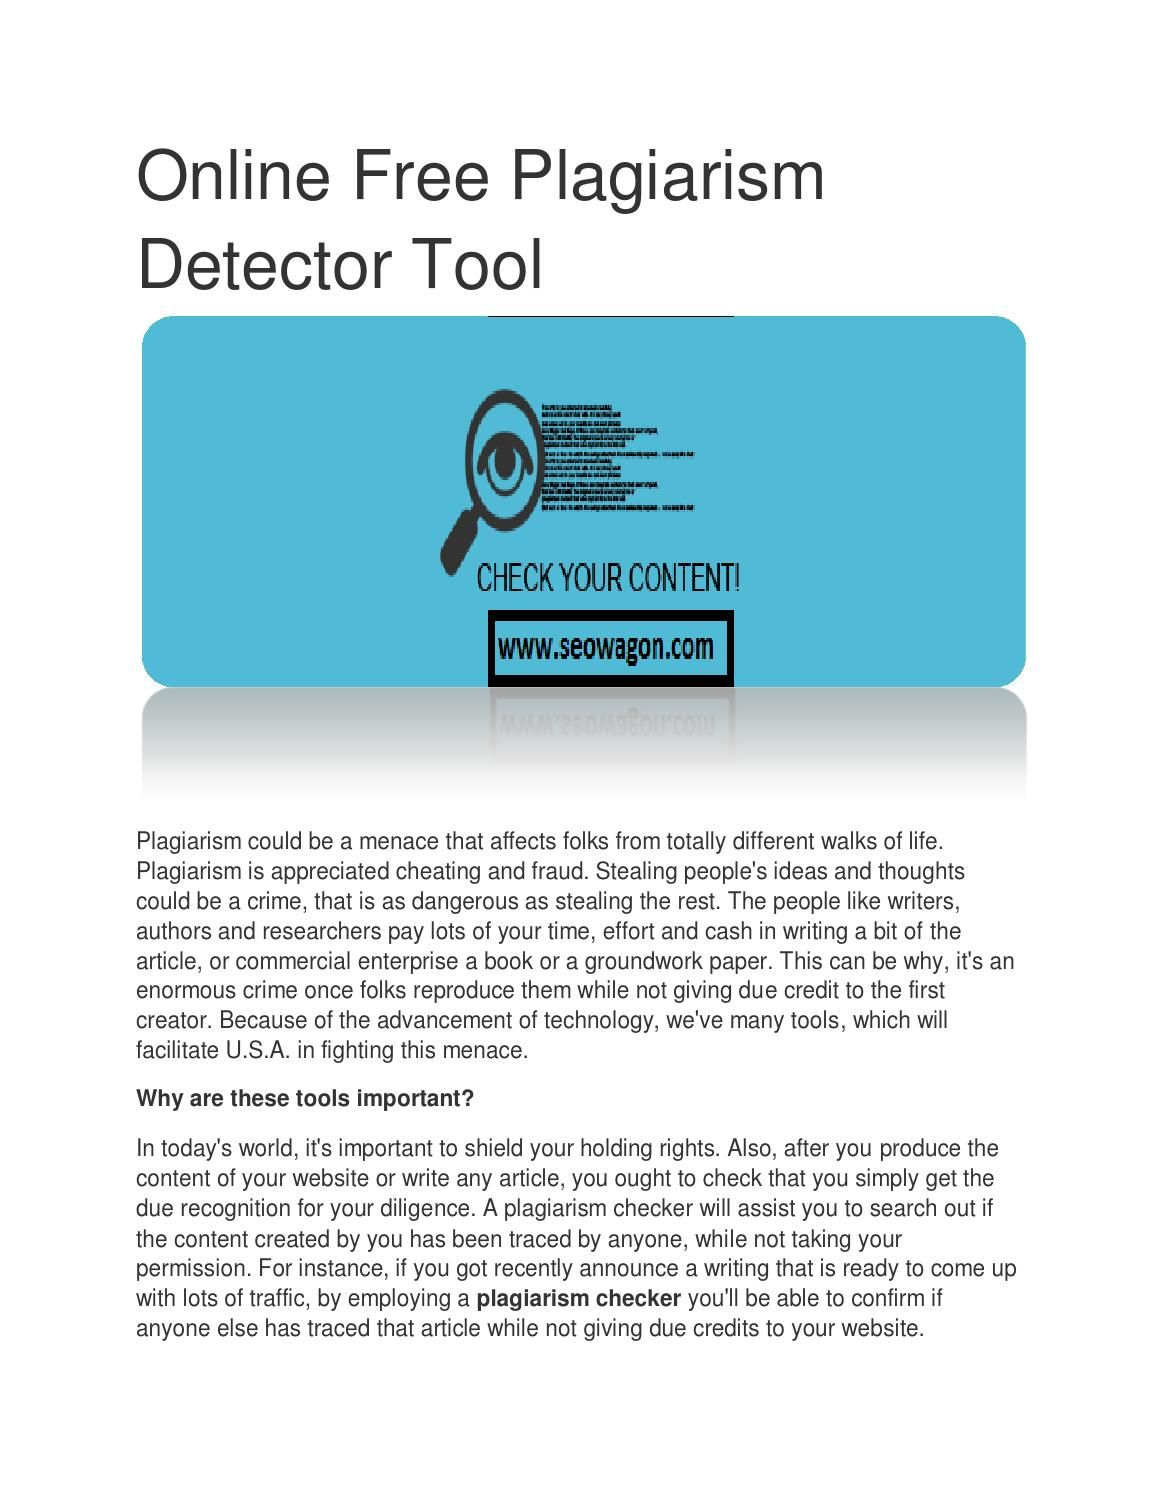 seo plagiarism checker free